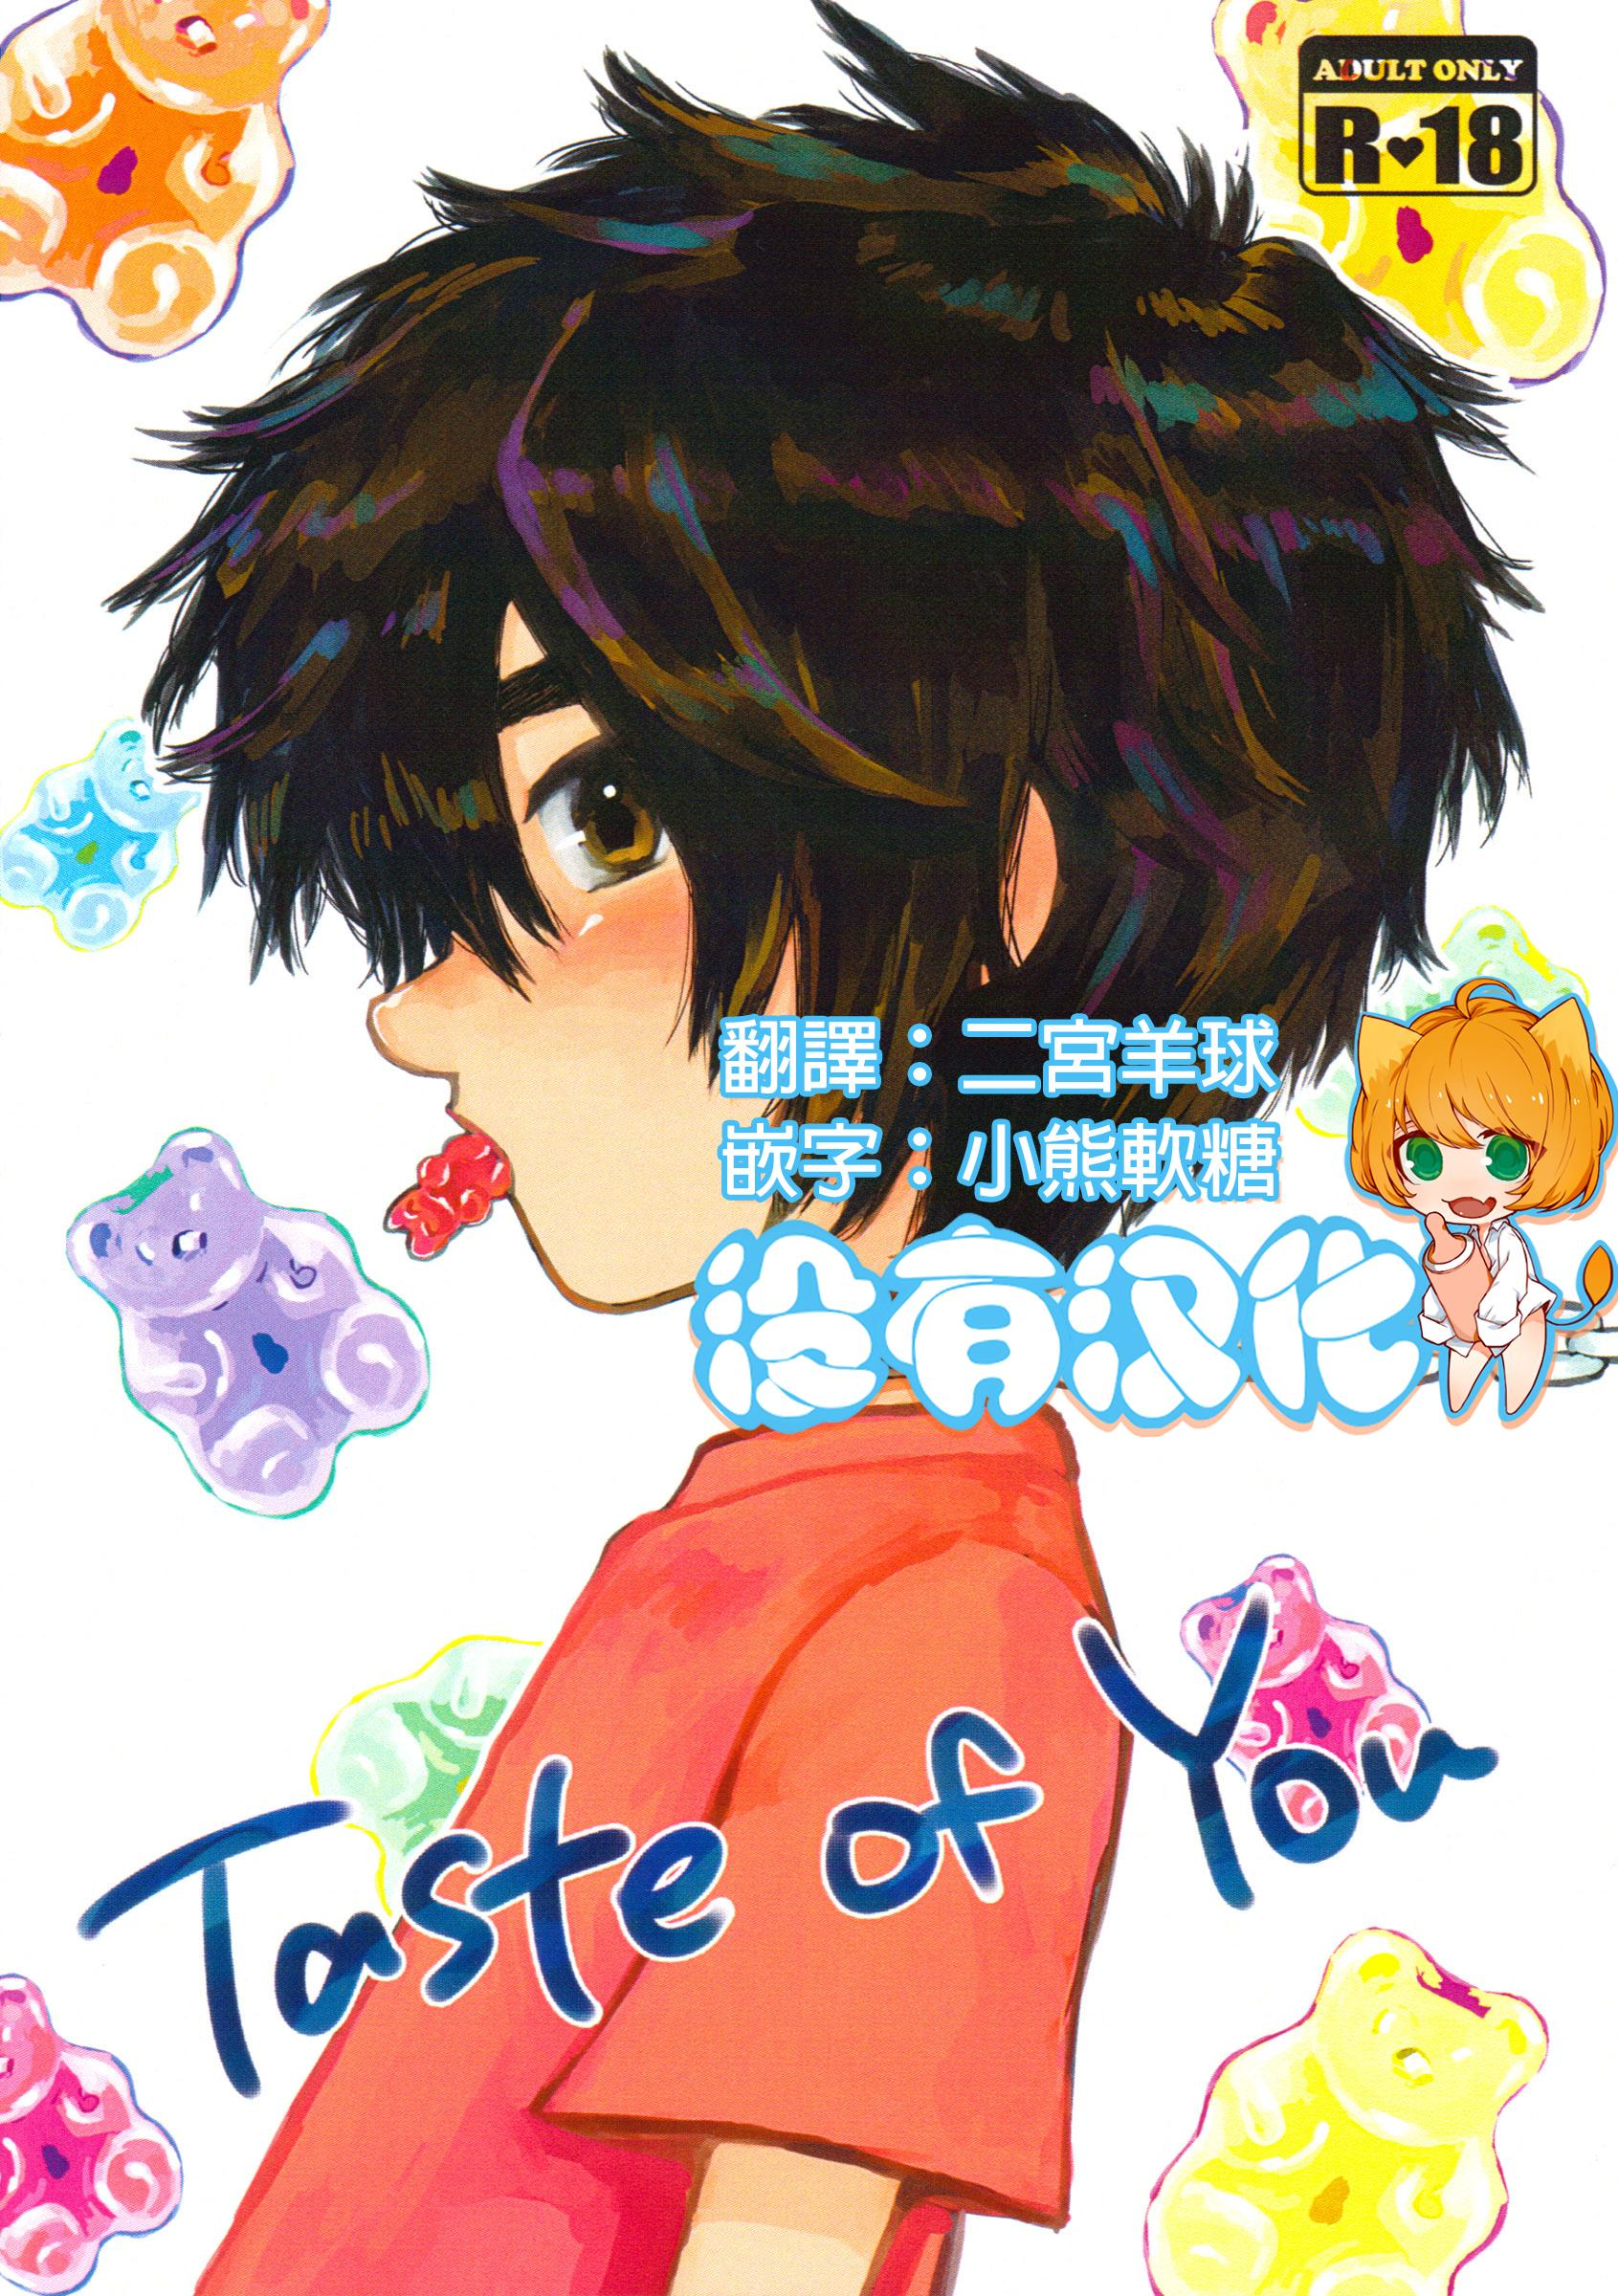 Taste of You 0